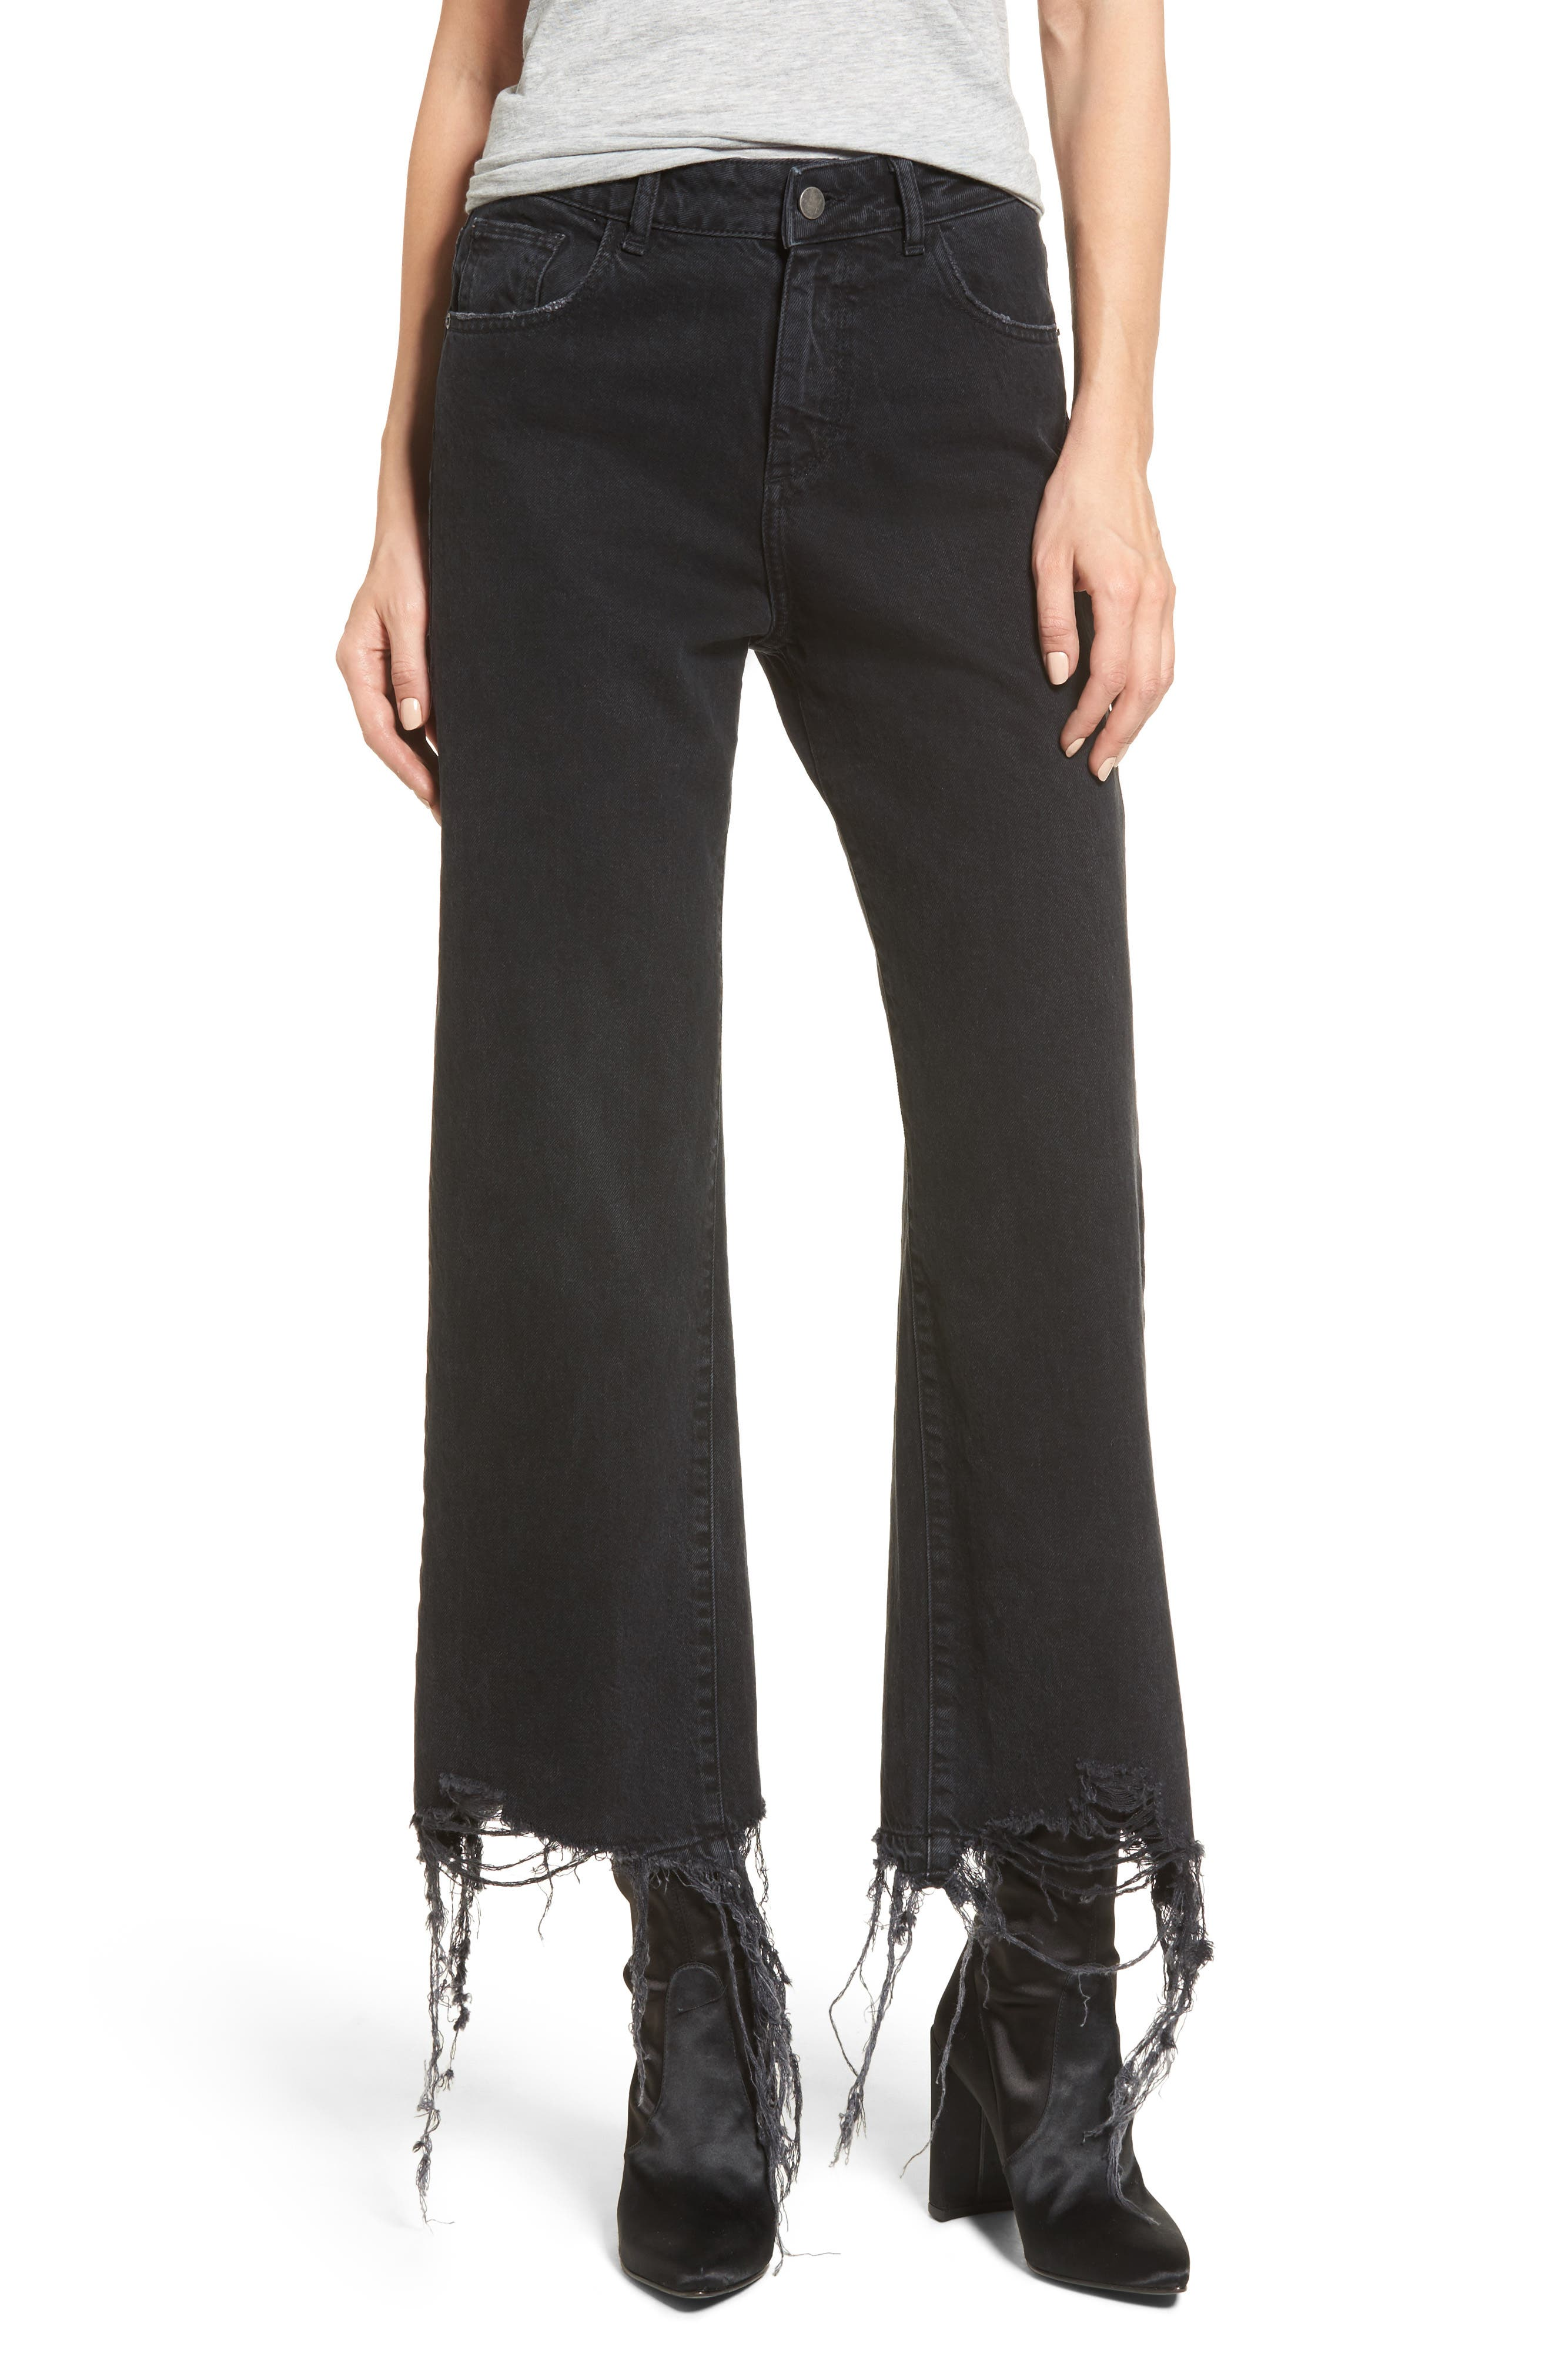 Main Image - DL1961 Hepburn High Waist Wide Leg Jeans (Savannah Destroy)